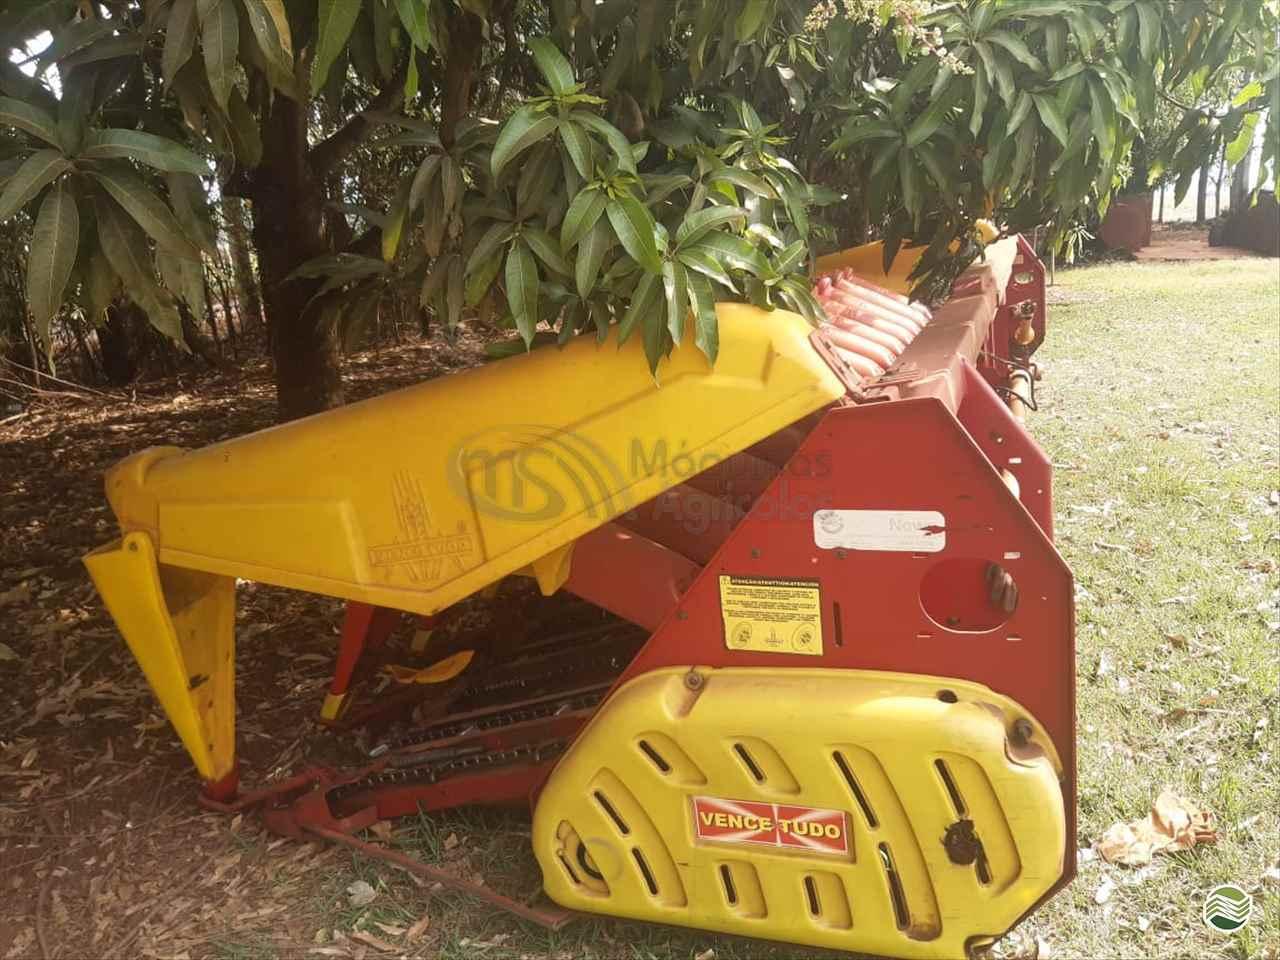 BOCUDA 7720 de MS Máquinas Agrícolas - DOURADOS/MS